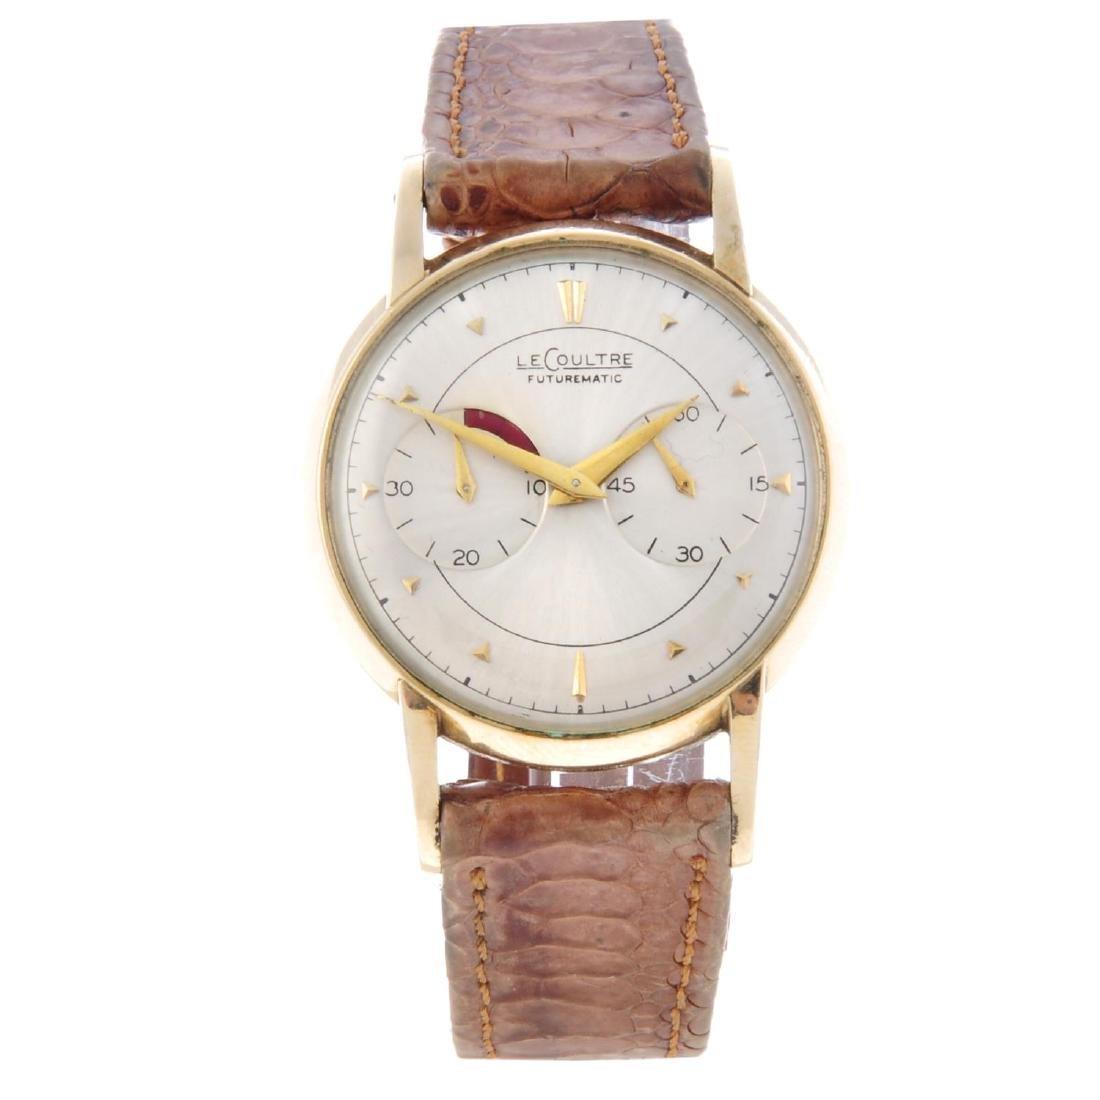 LECOULTRE - a gentleman's Futurematic wrist watch. Gold